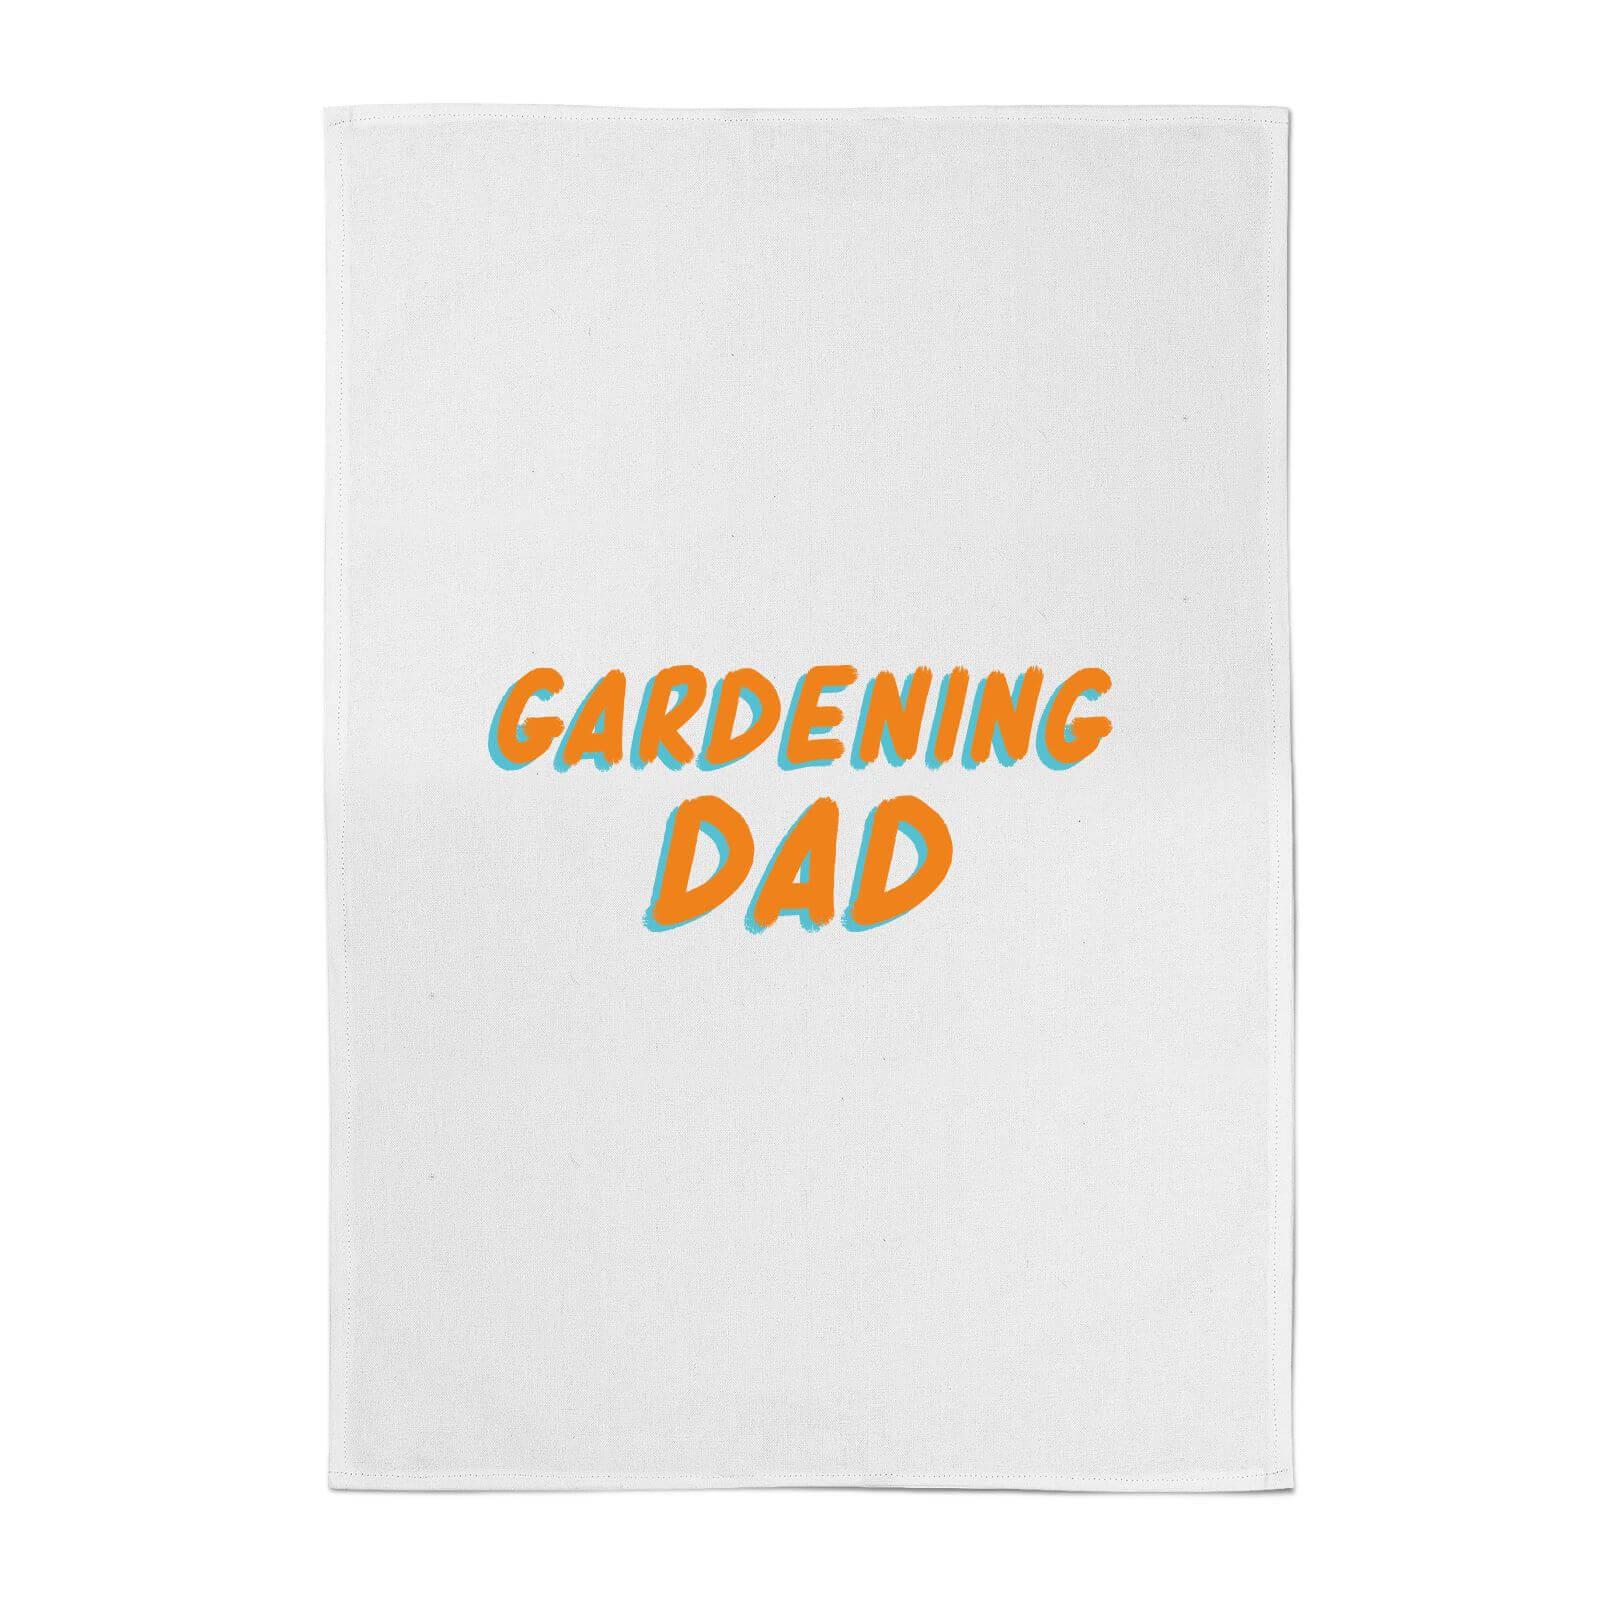 Gardening Dad Cotton Tea Towel